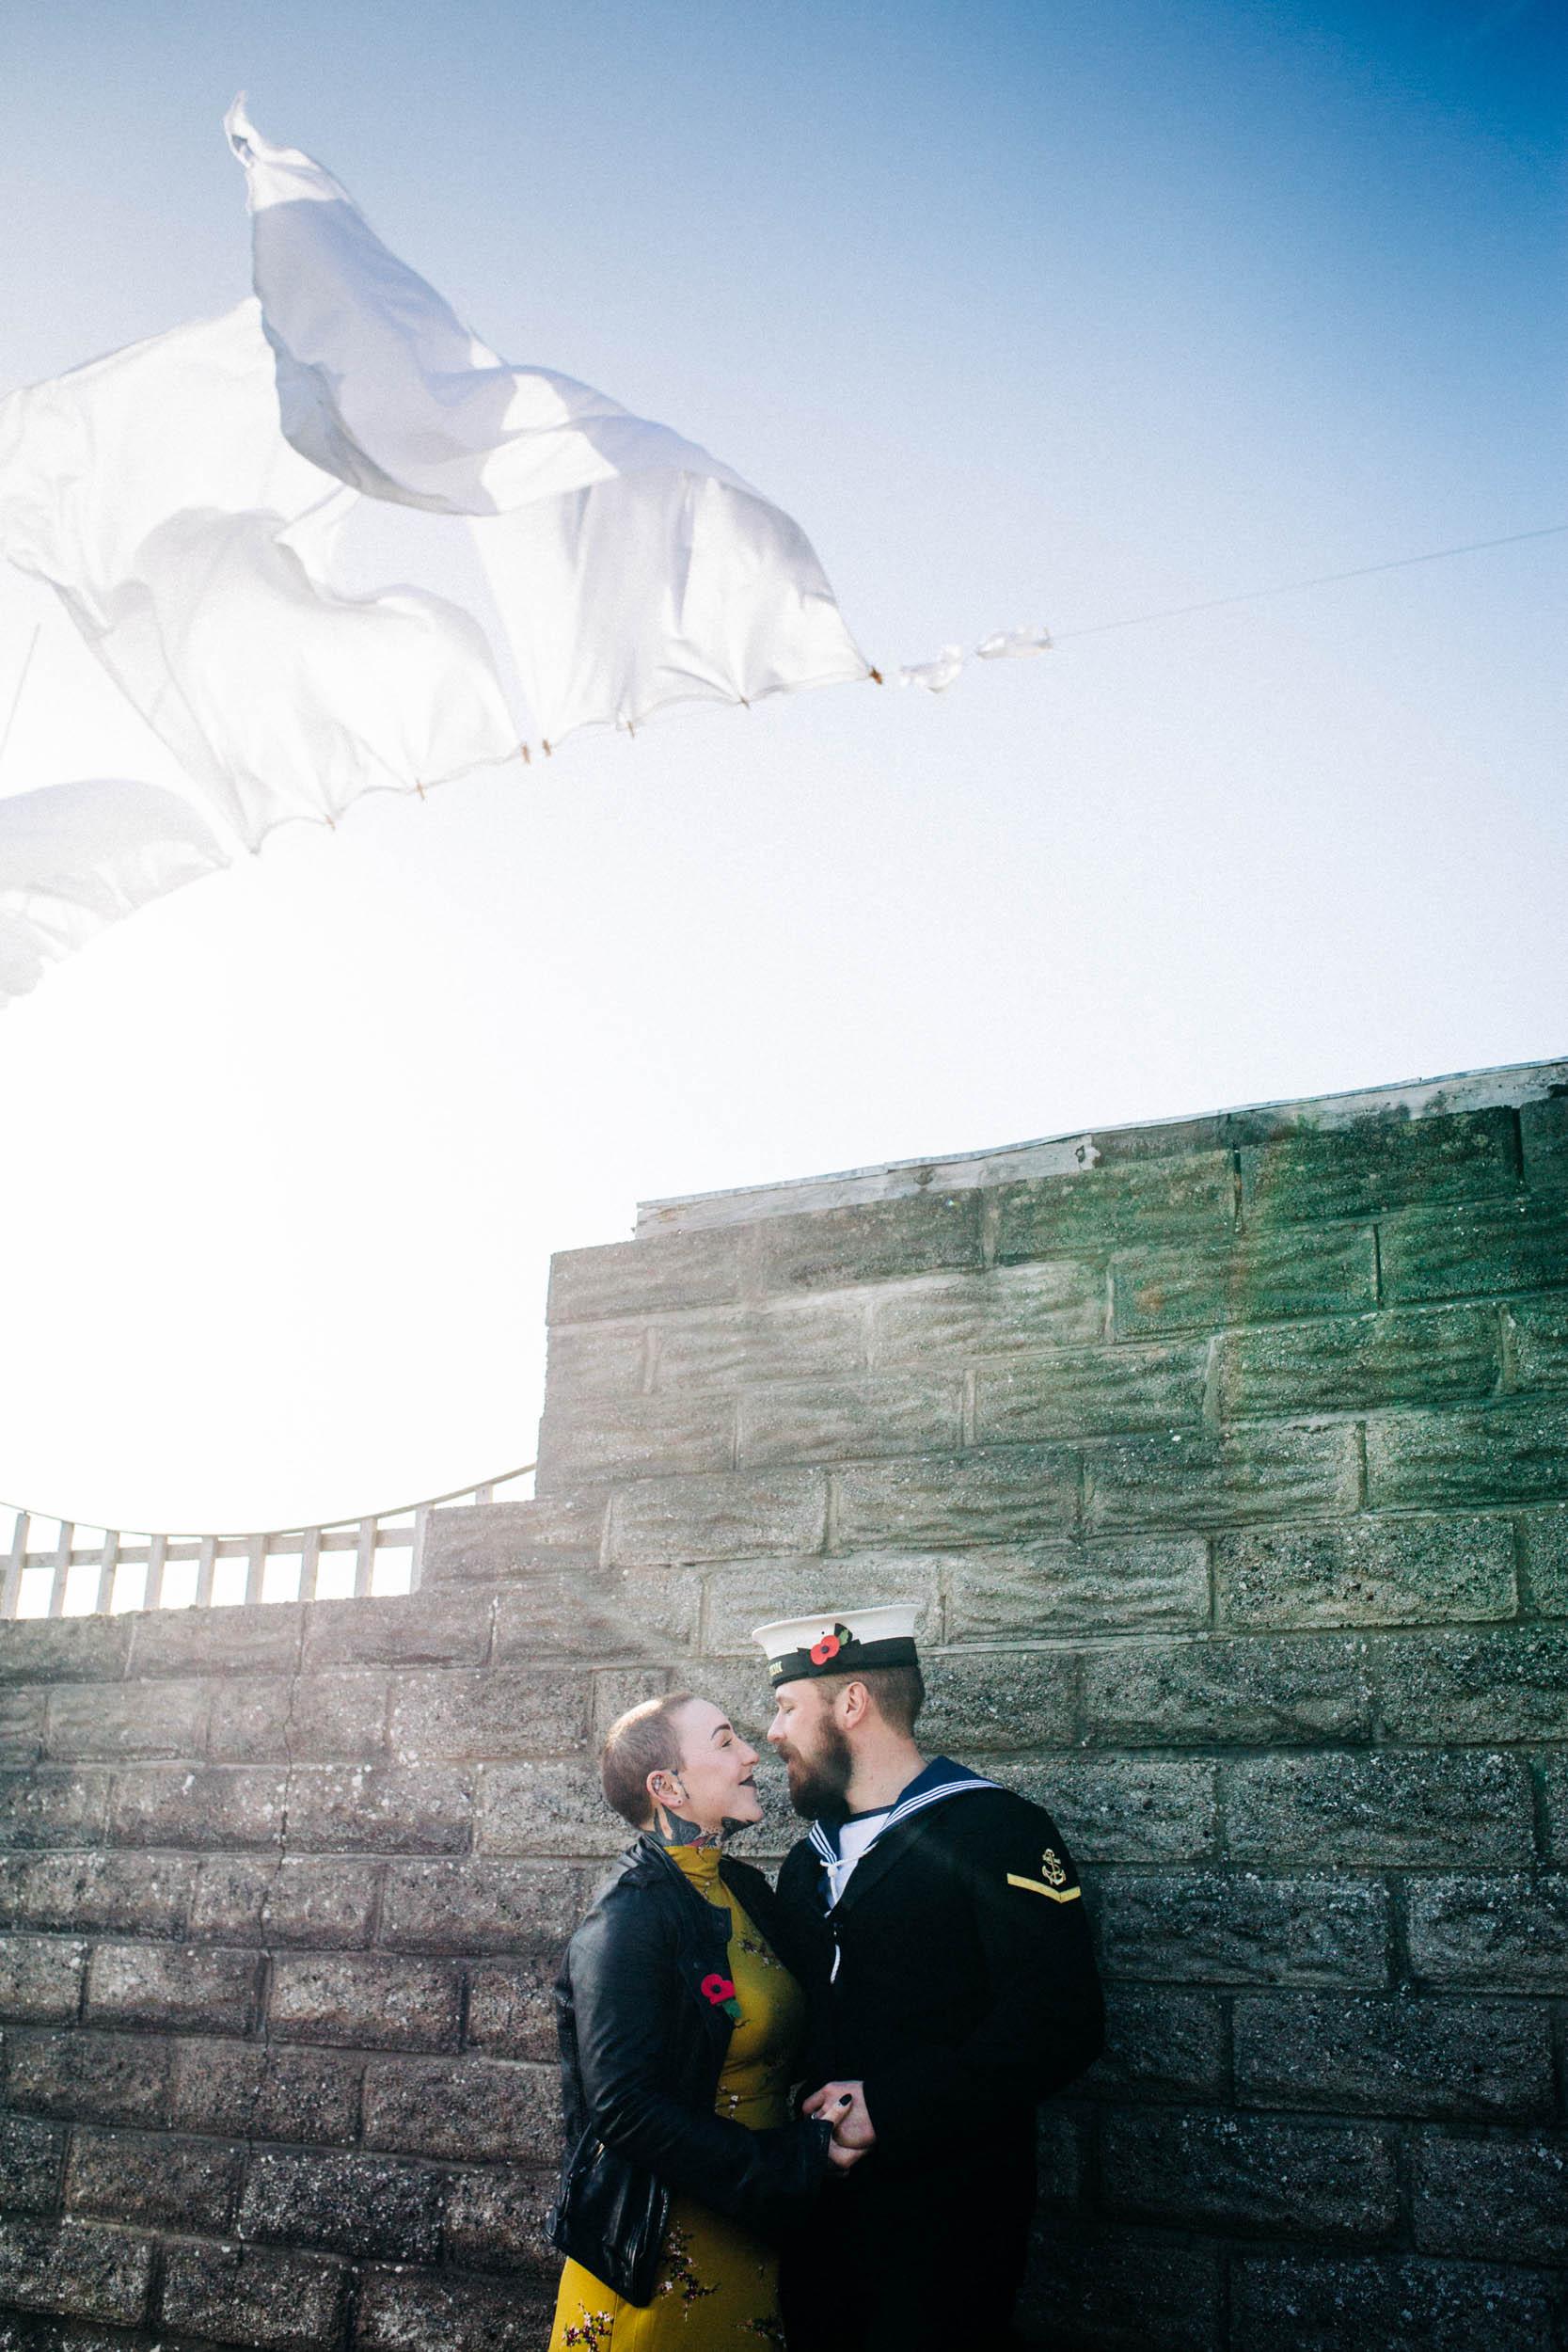 Alex_Sedgmond_Photography-SouthWalesWeddingPhotography-Wedding-Photographer-Cardiff-Southwaleswedding-couples2.jpg